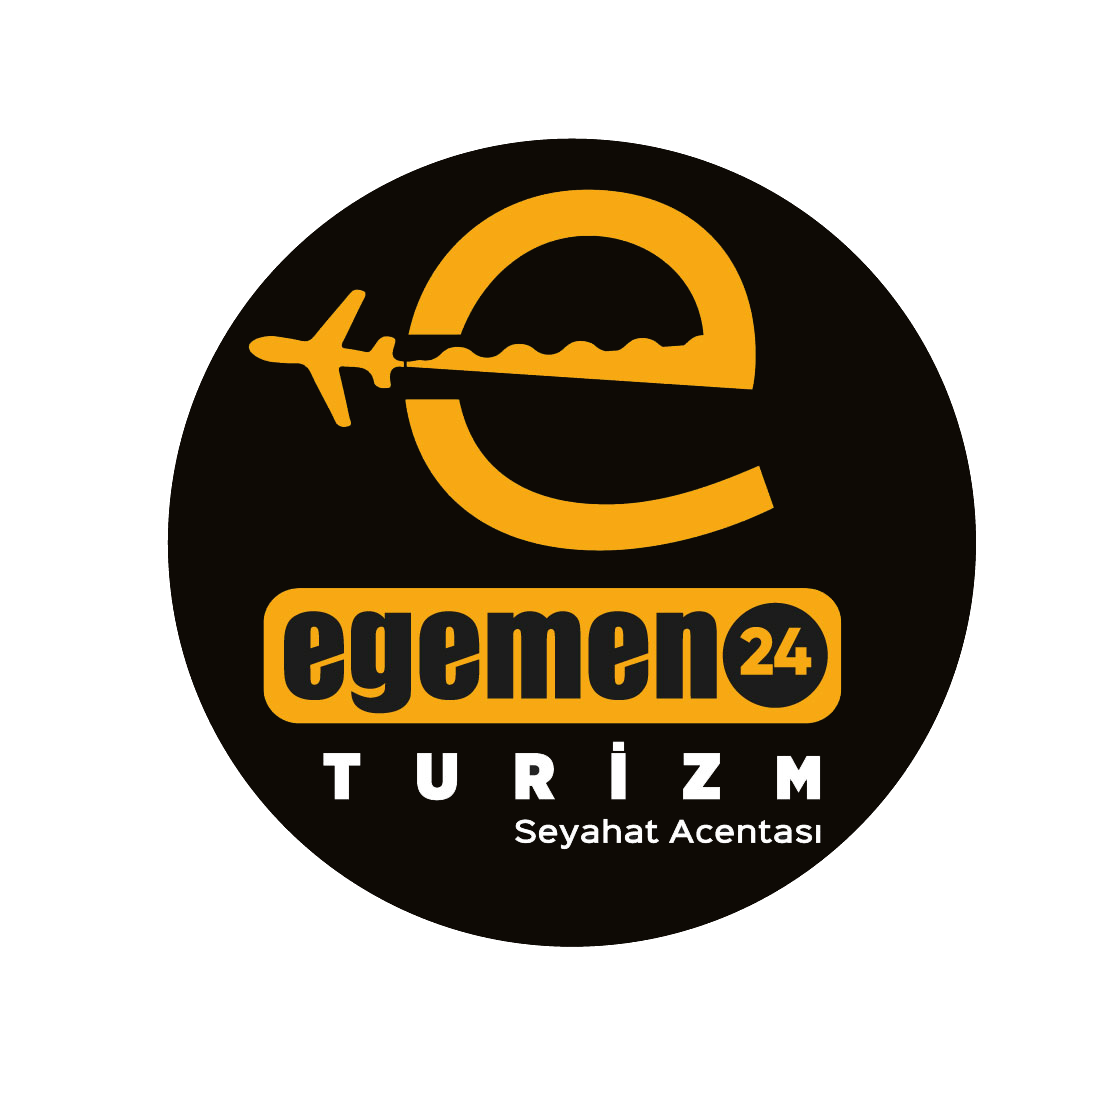 EGEMEN 24 TURİZM SEYAHAT ACENTASI